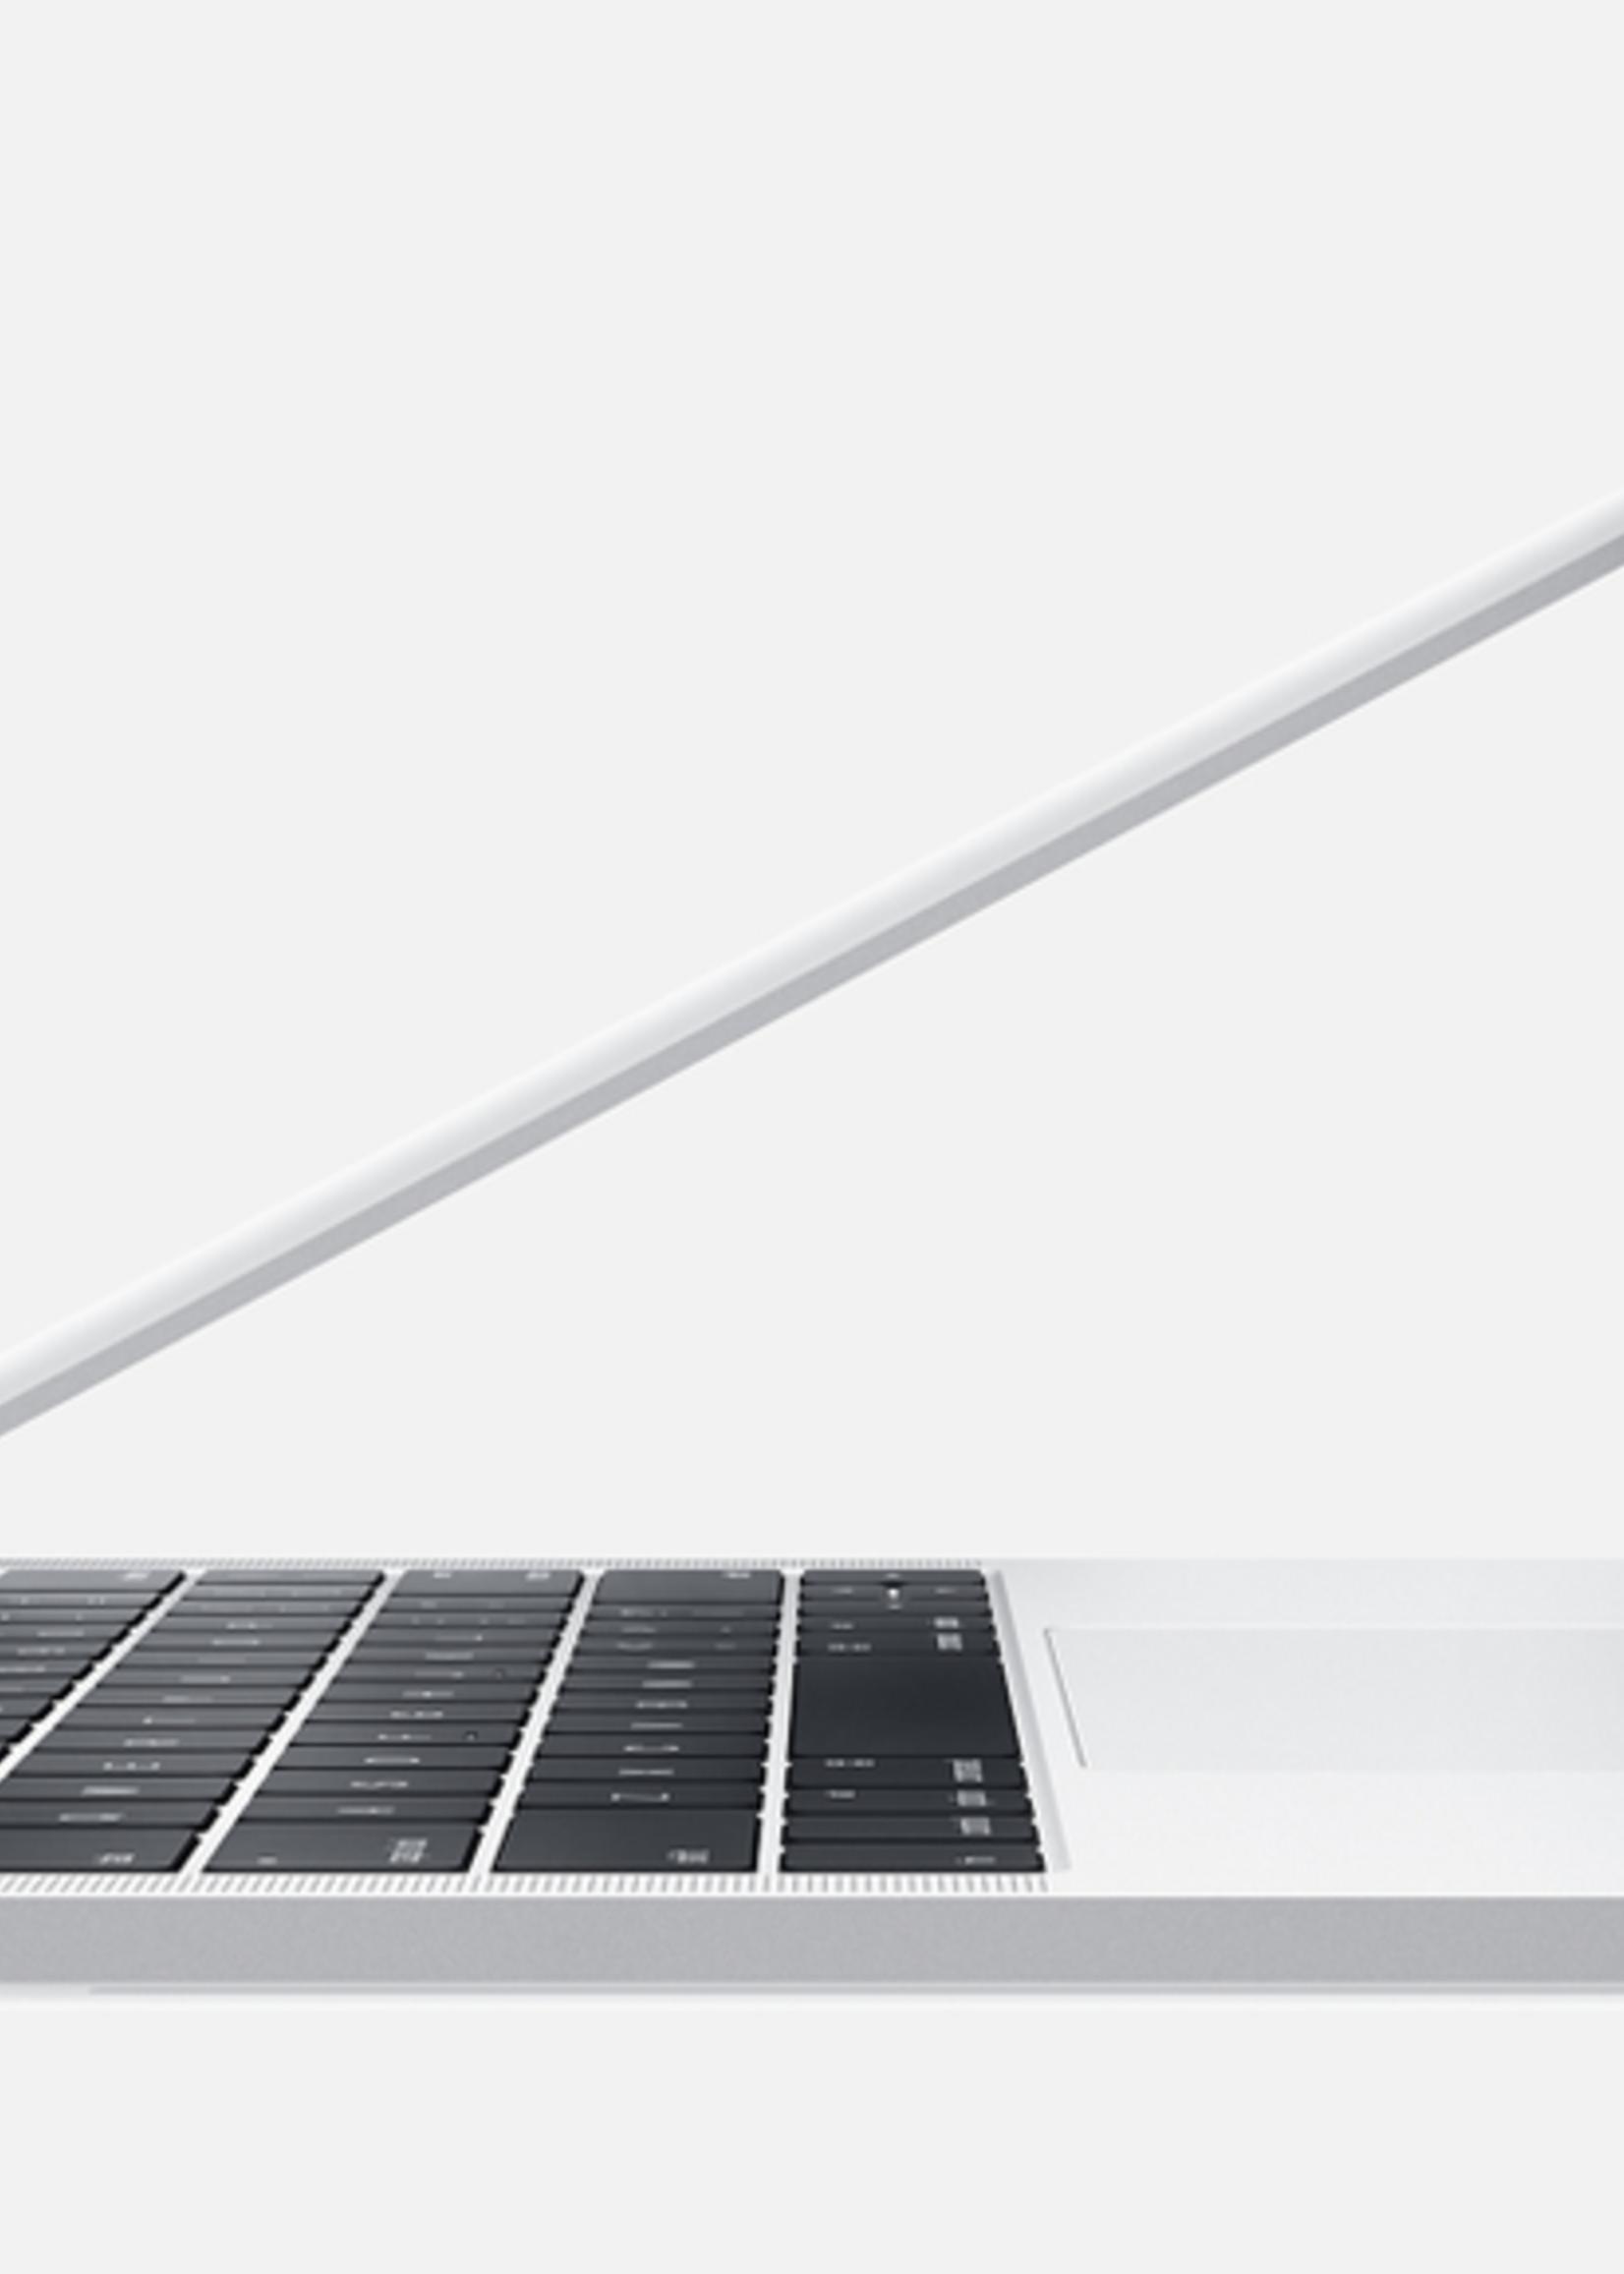 "13"" MacBook Pro w/ touch bar - 256GB - Silver - 2019"